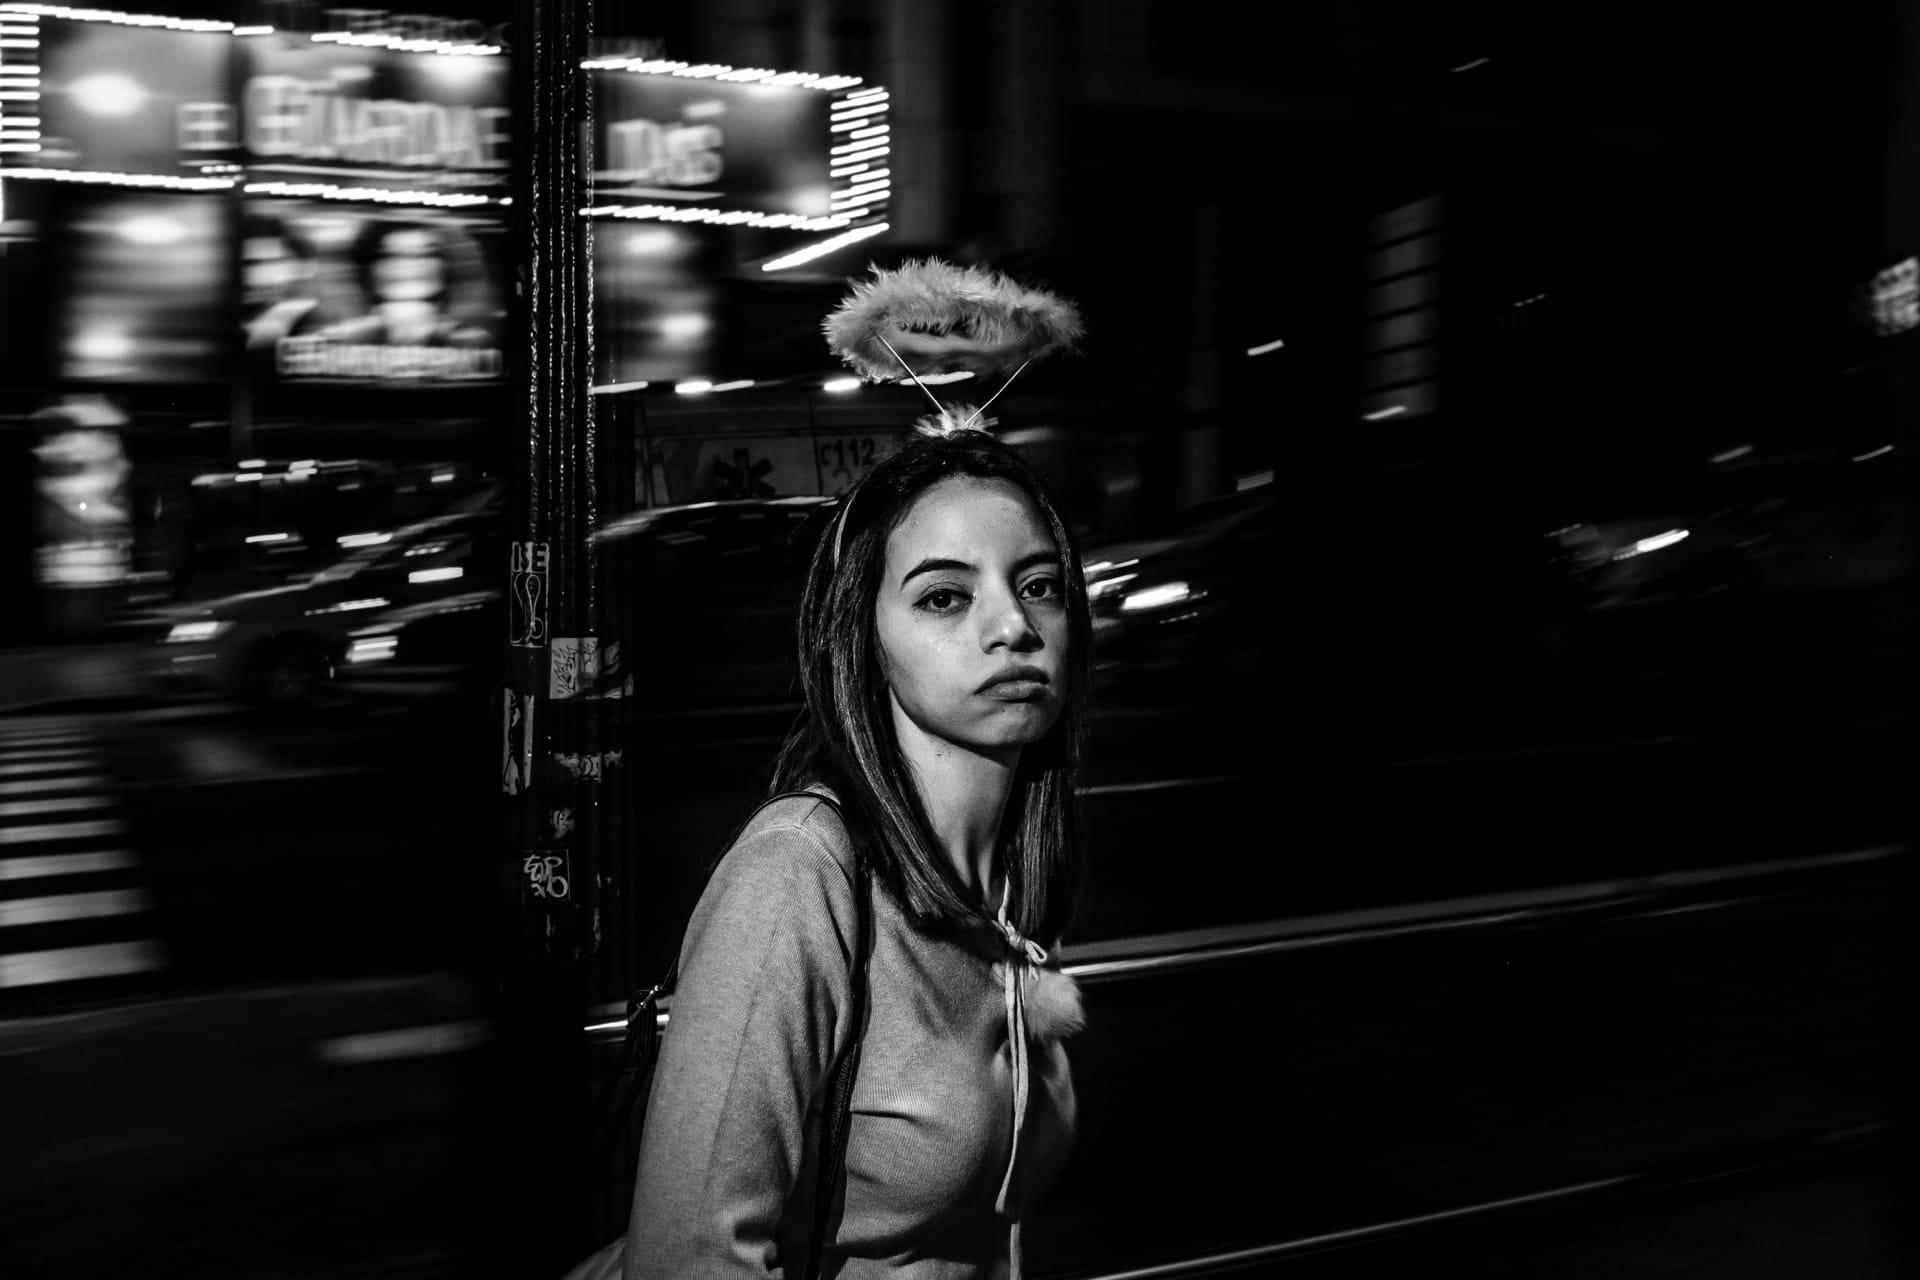 """Flash Street Photography"" Street Photograph by Antonio Balsera"